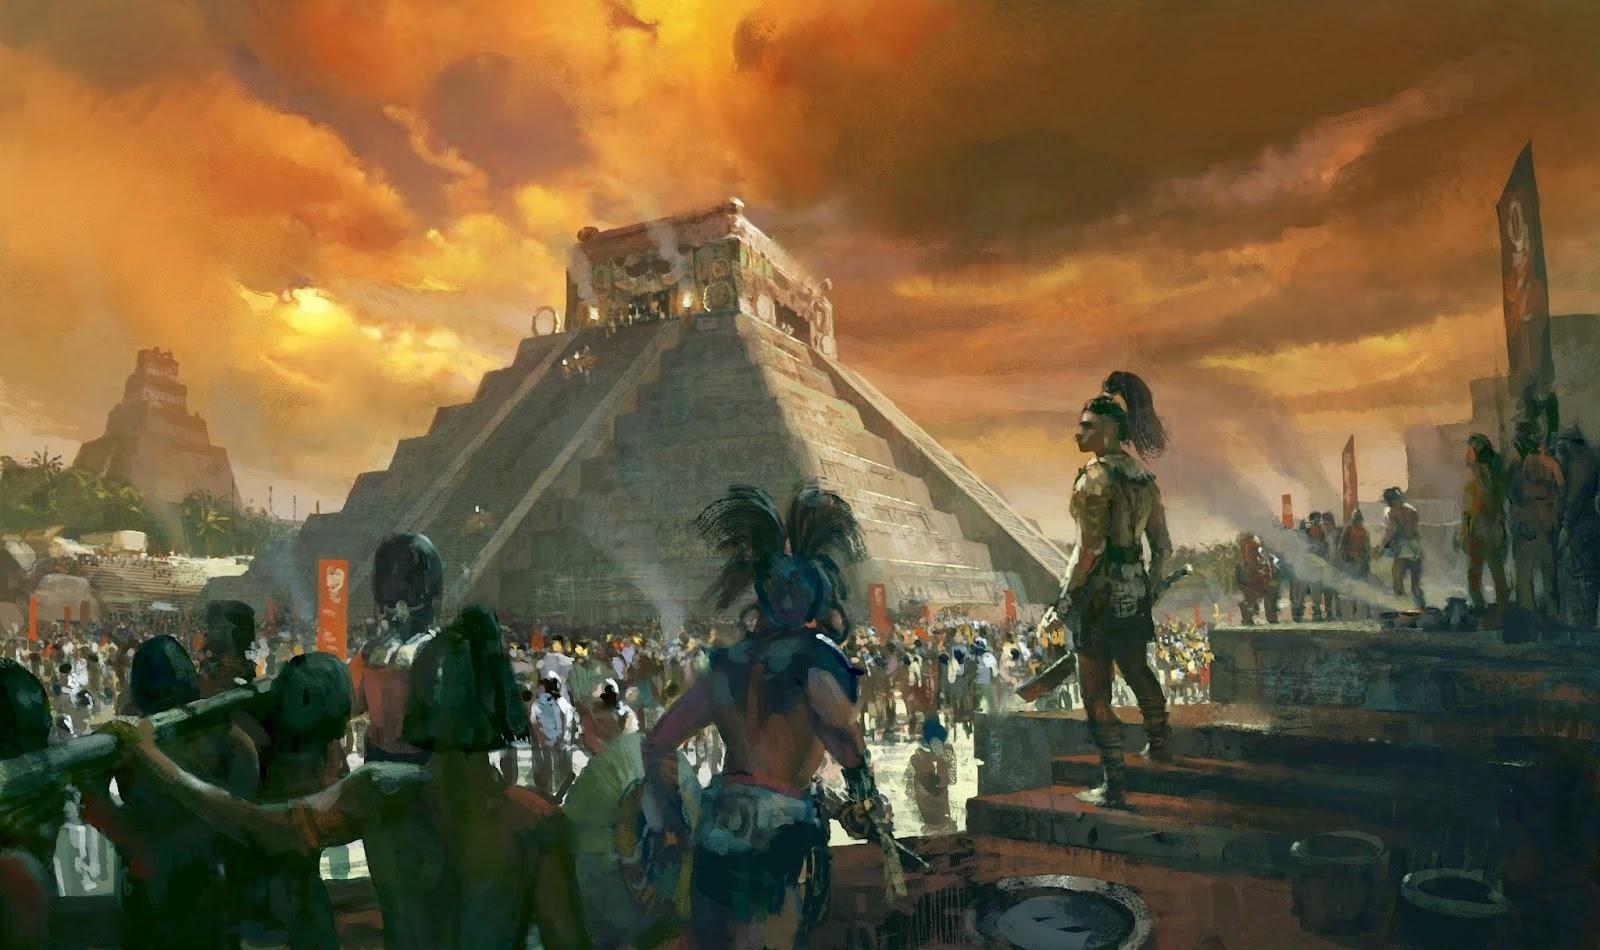 La era Maya